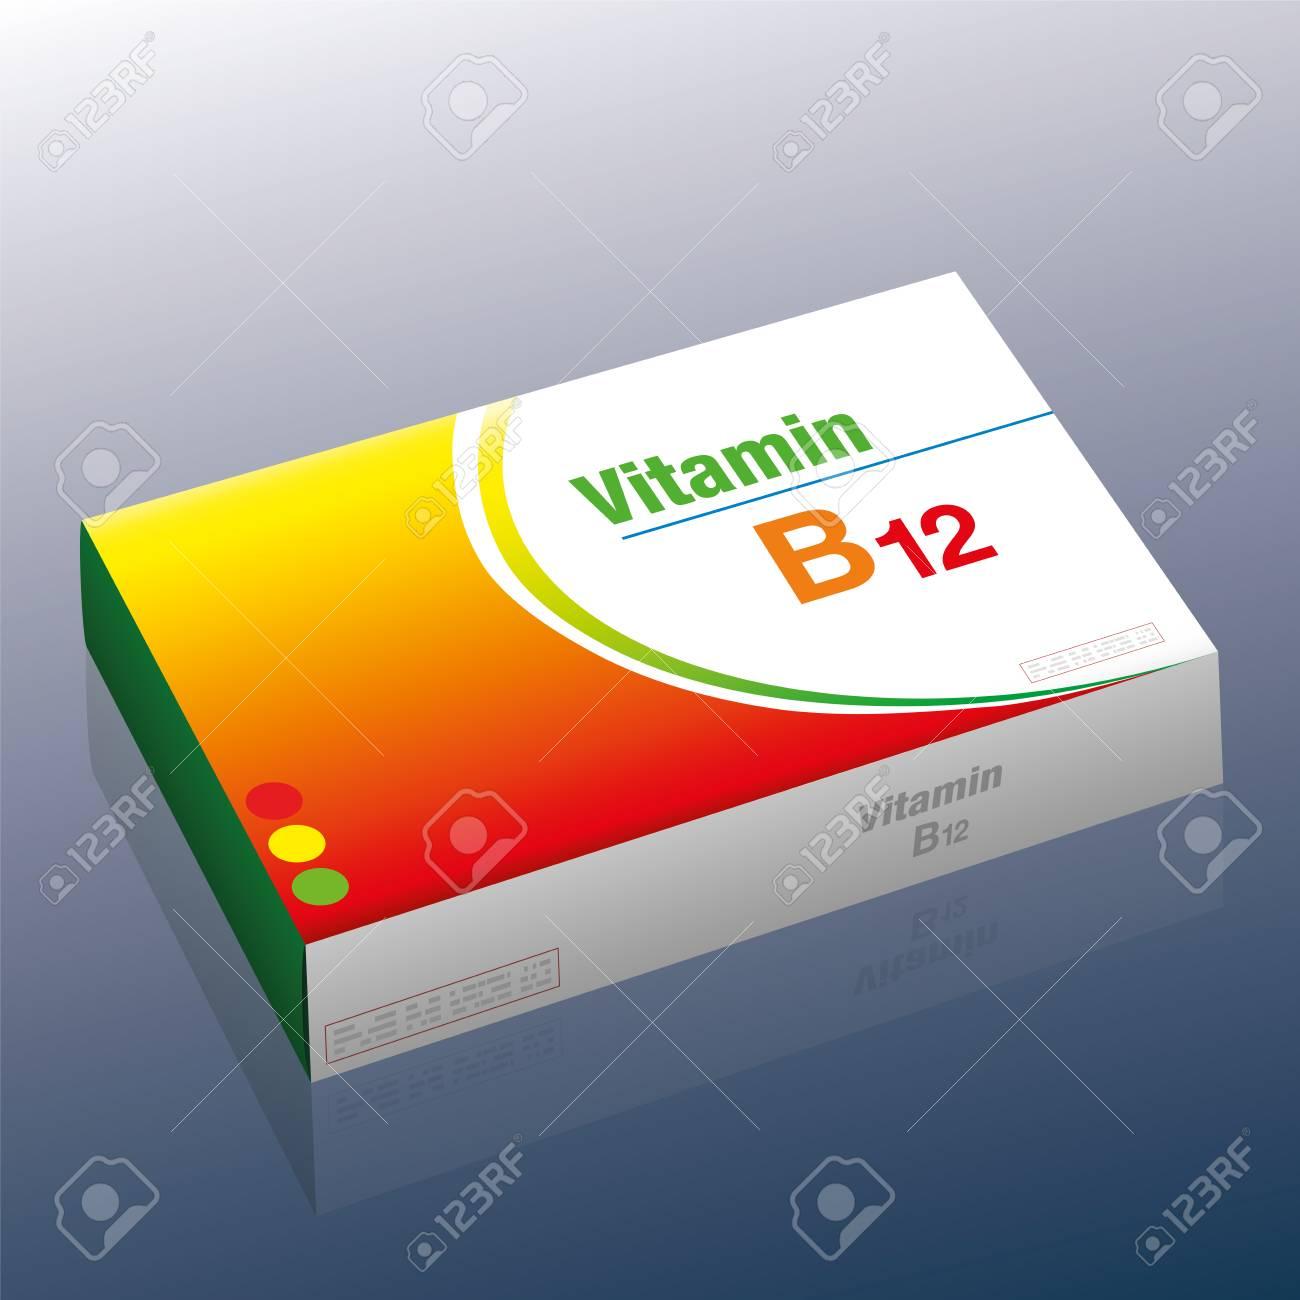 Caffeine pills weight loss pro ana picture 1